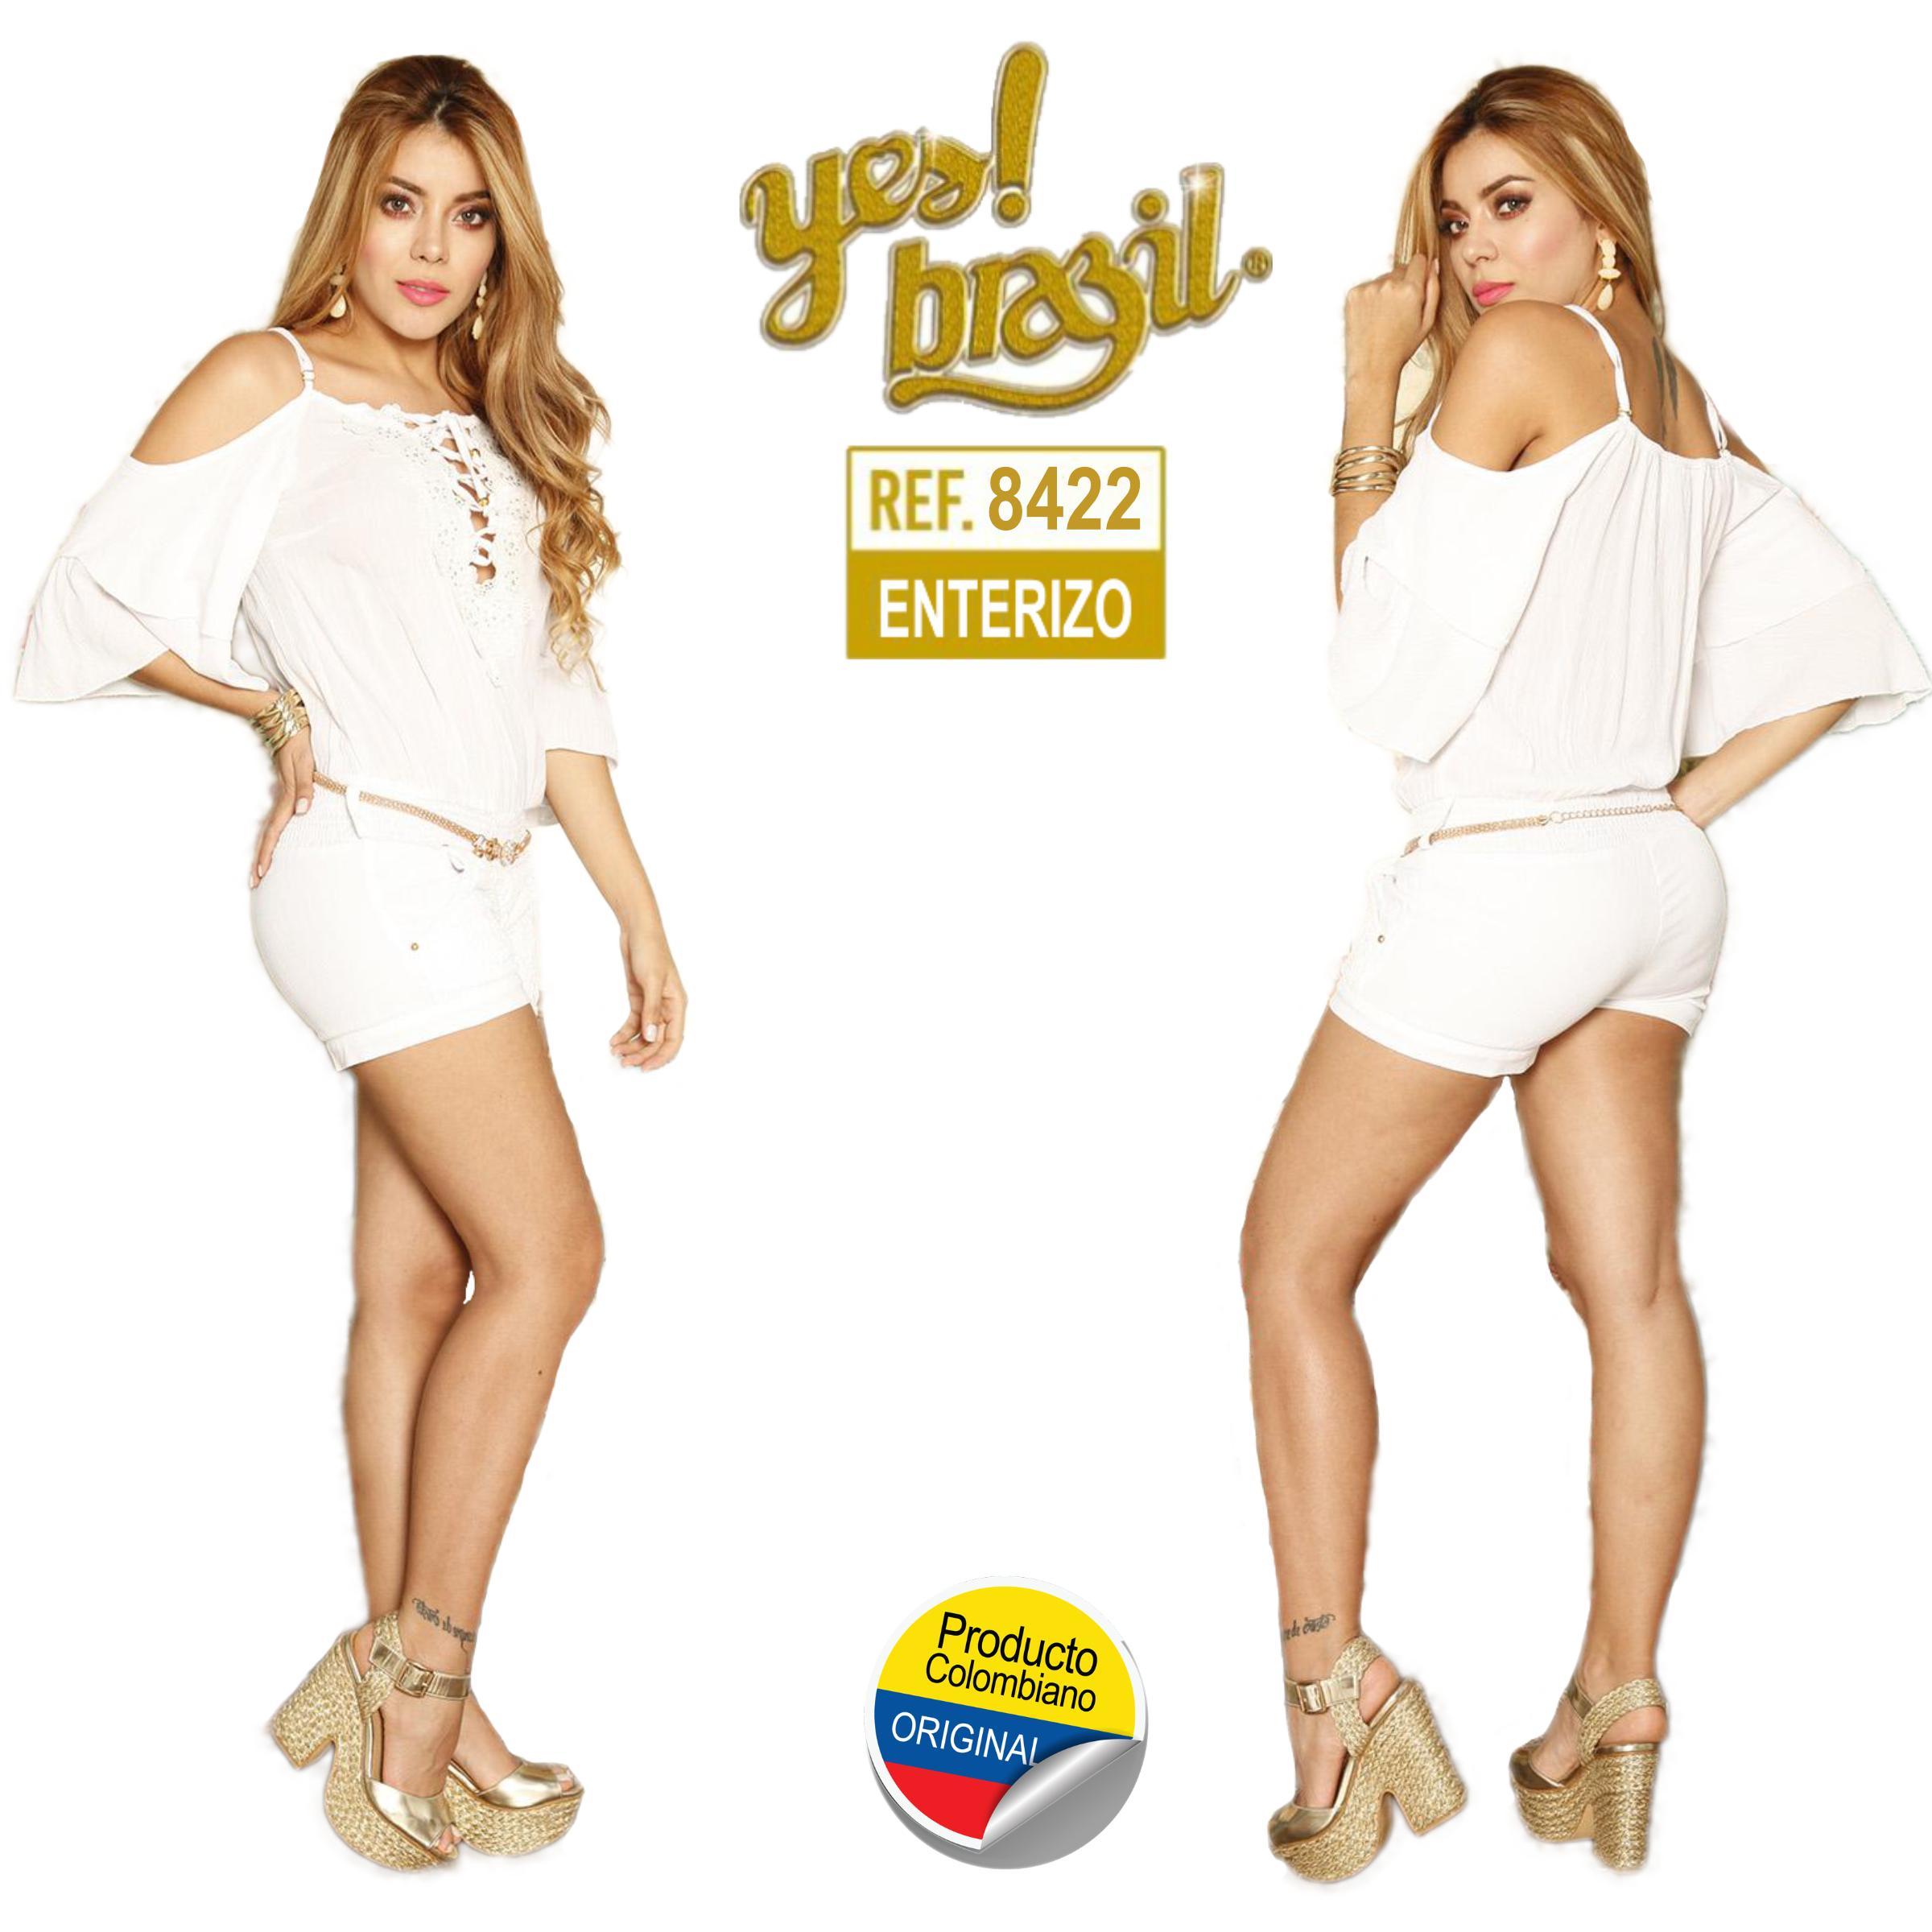 ENTERIZO SHORT COLOMBIANO YEZ BRASIL